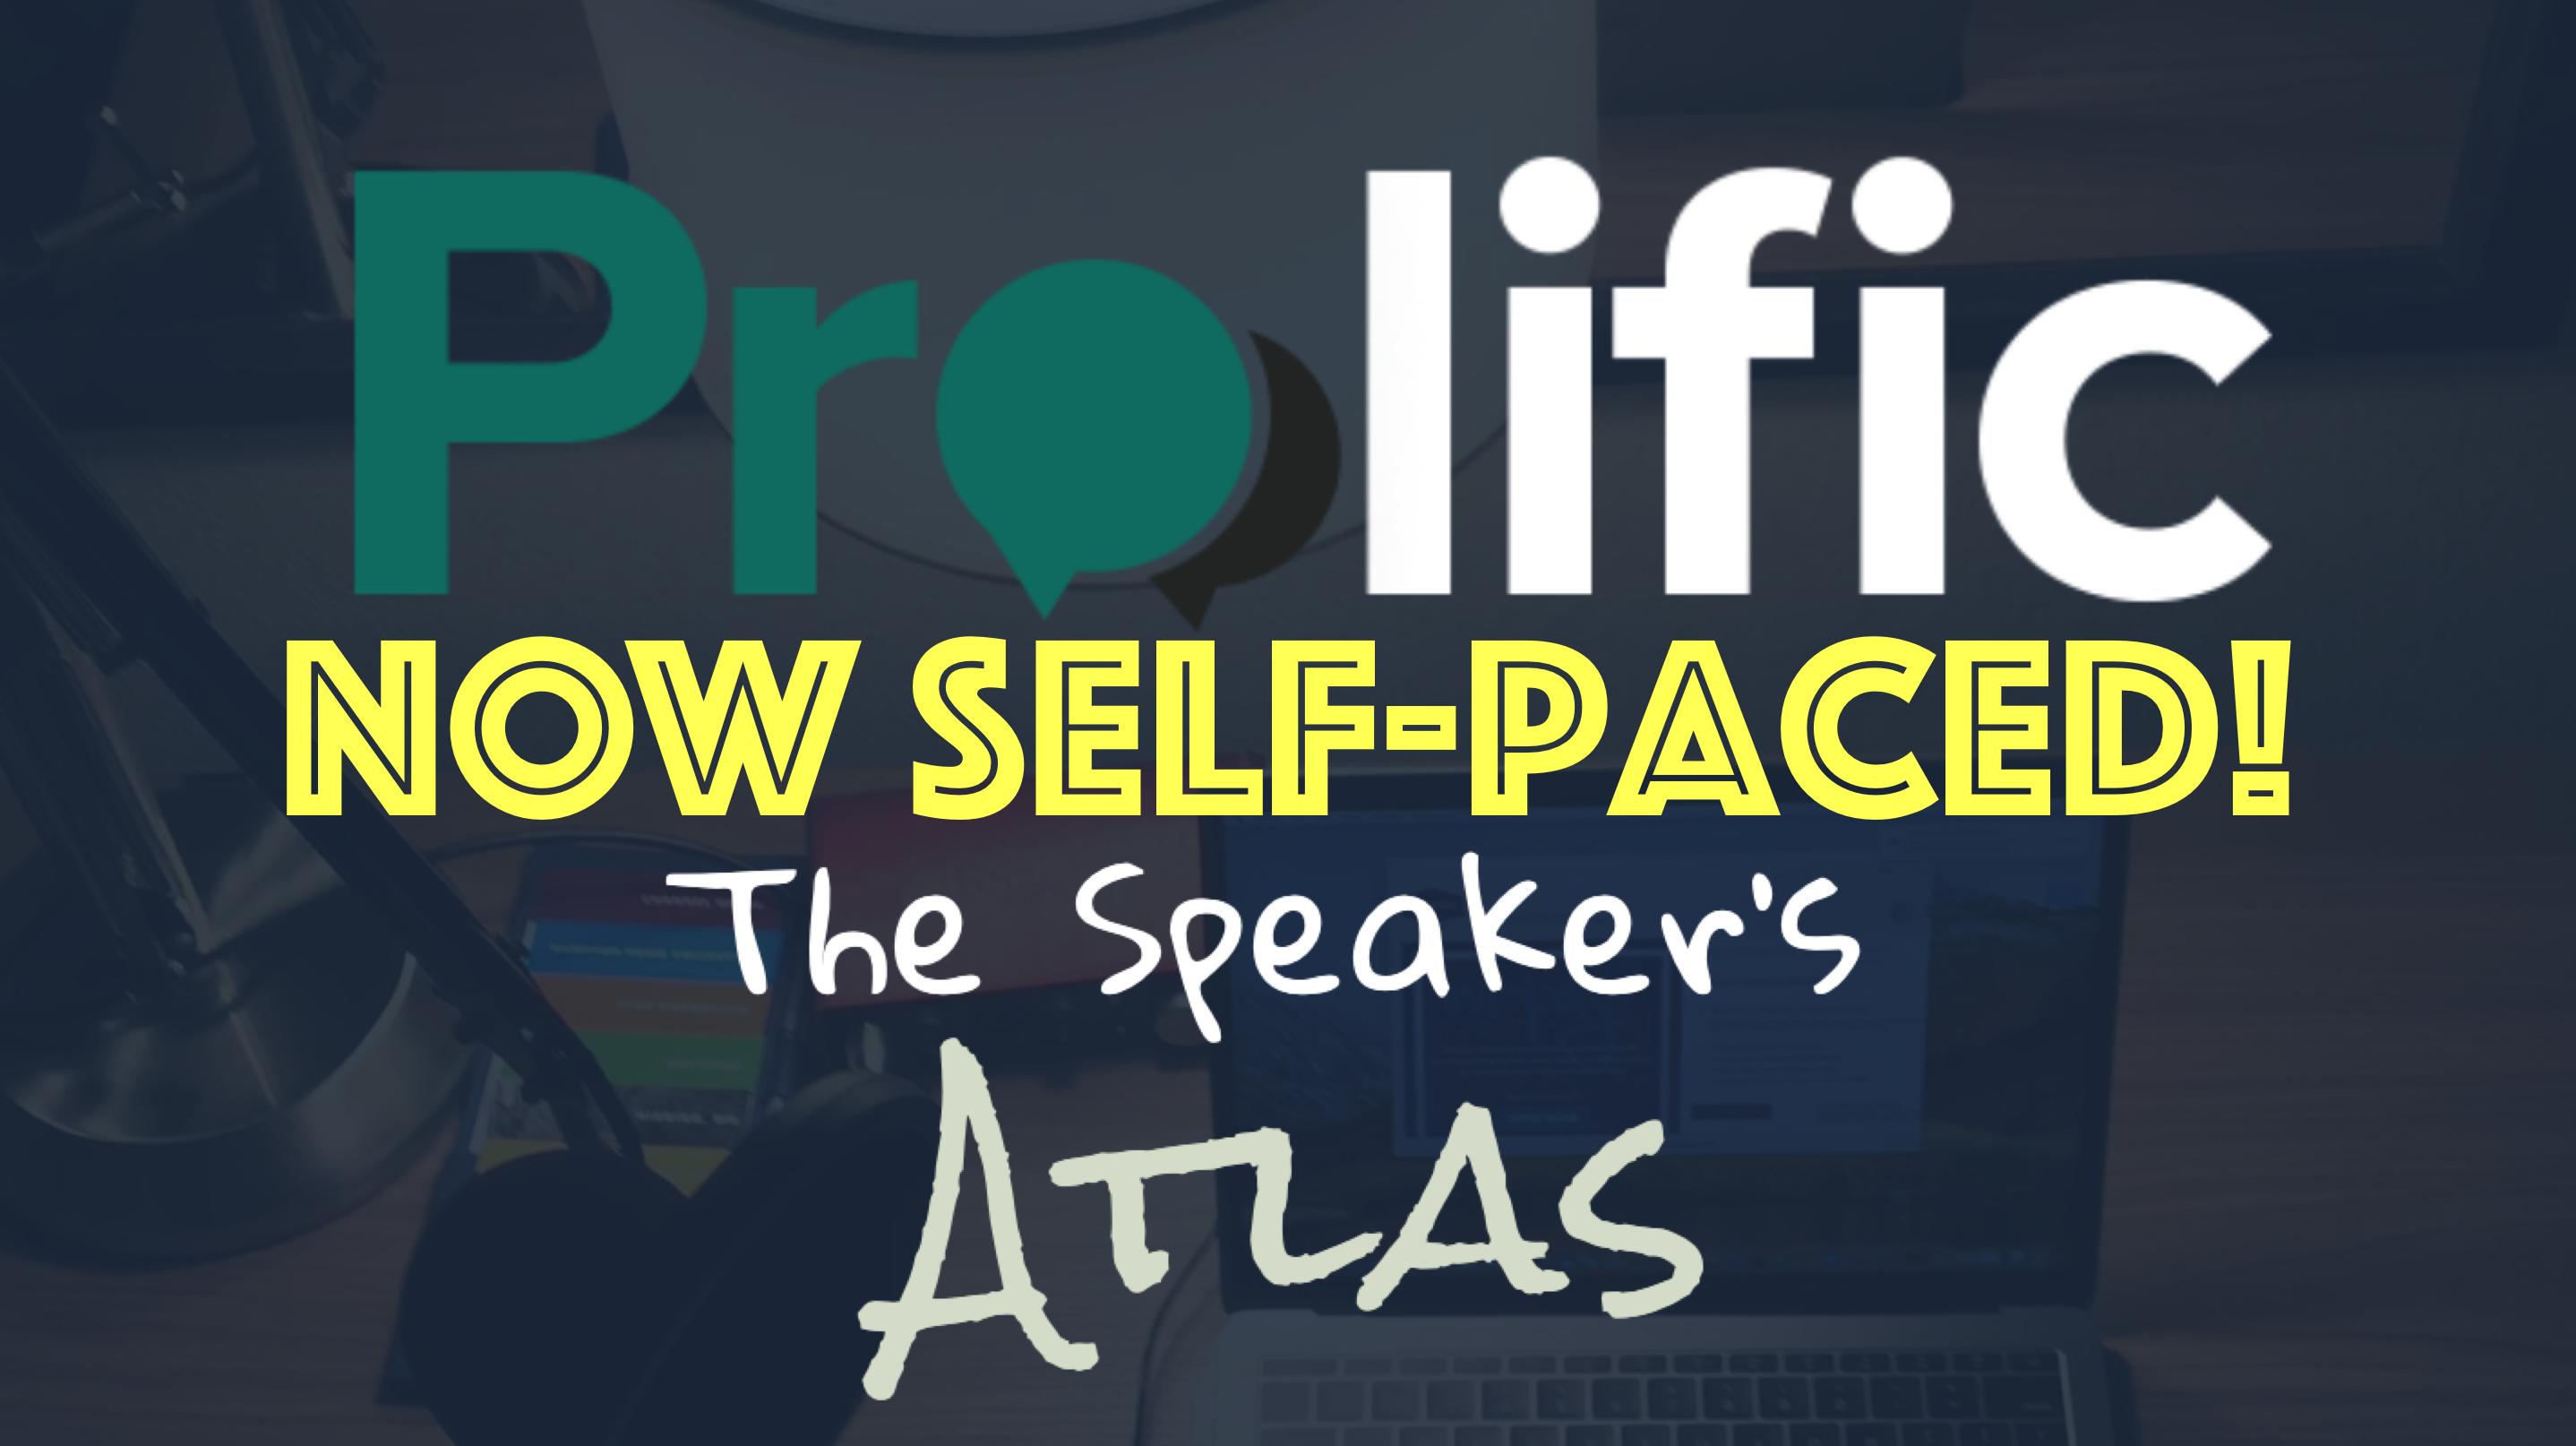 Speaker's Atlas Update!